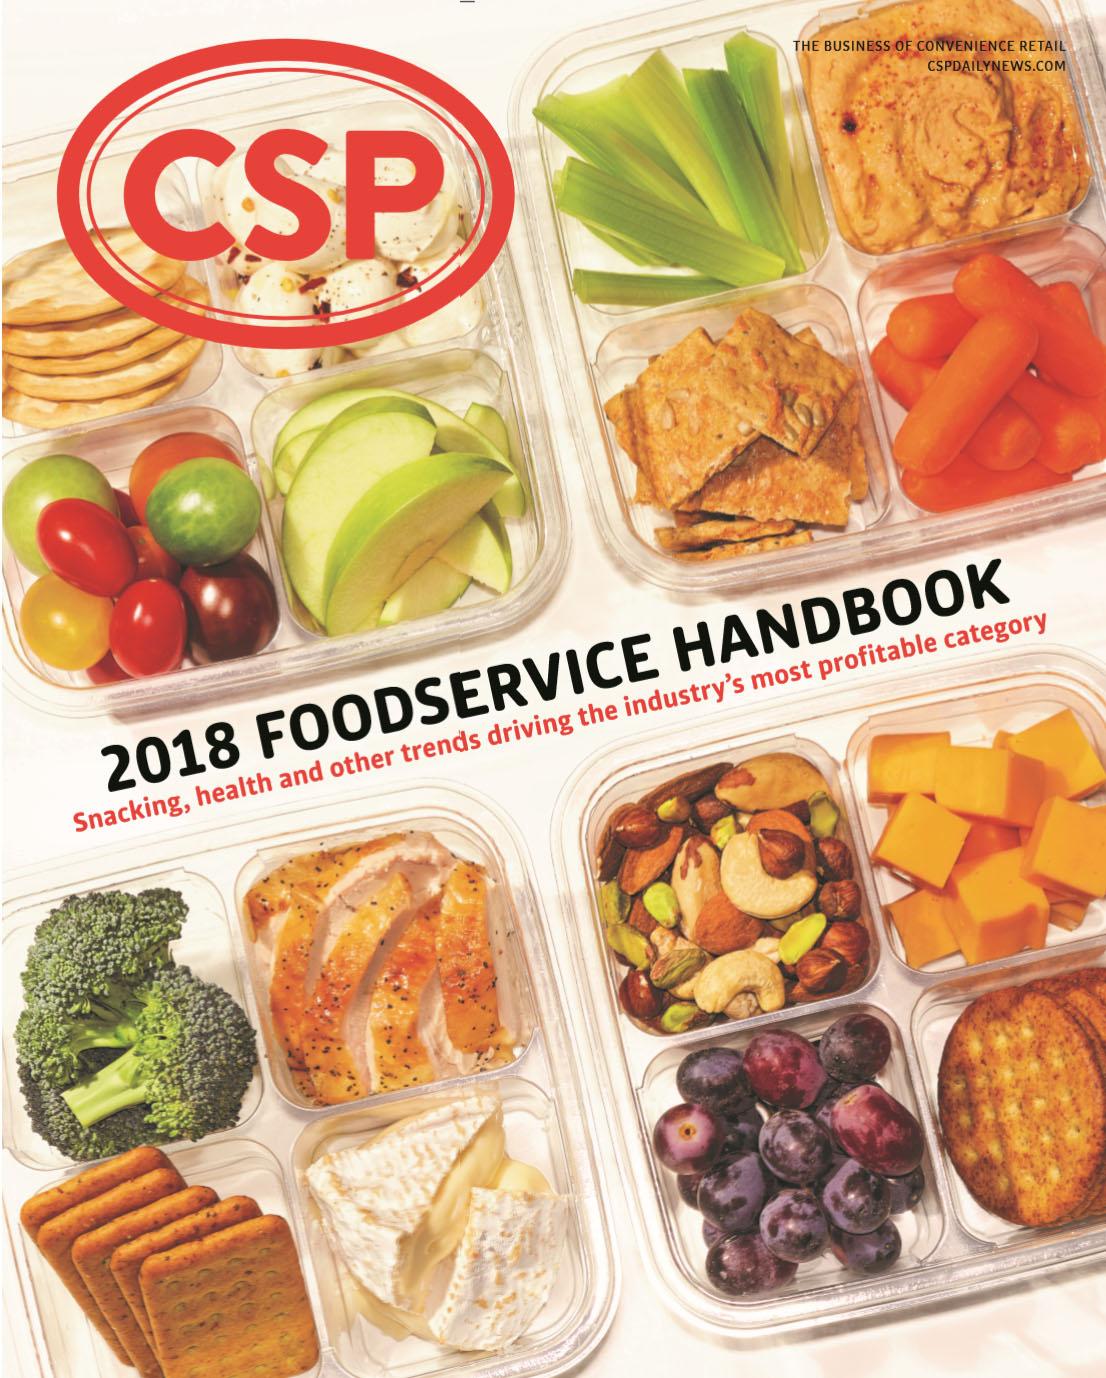 CSP 2018 Foodservice Handbook